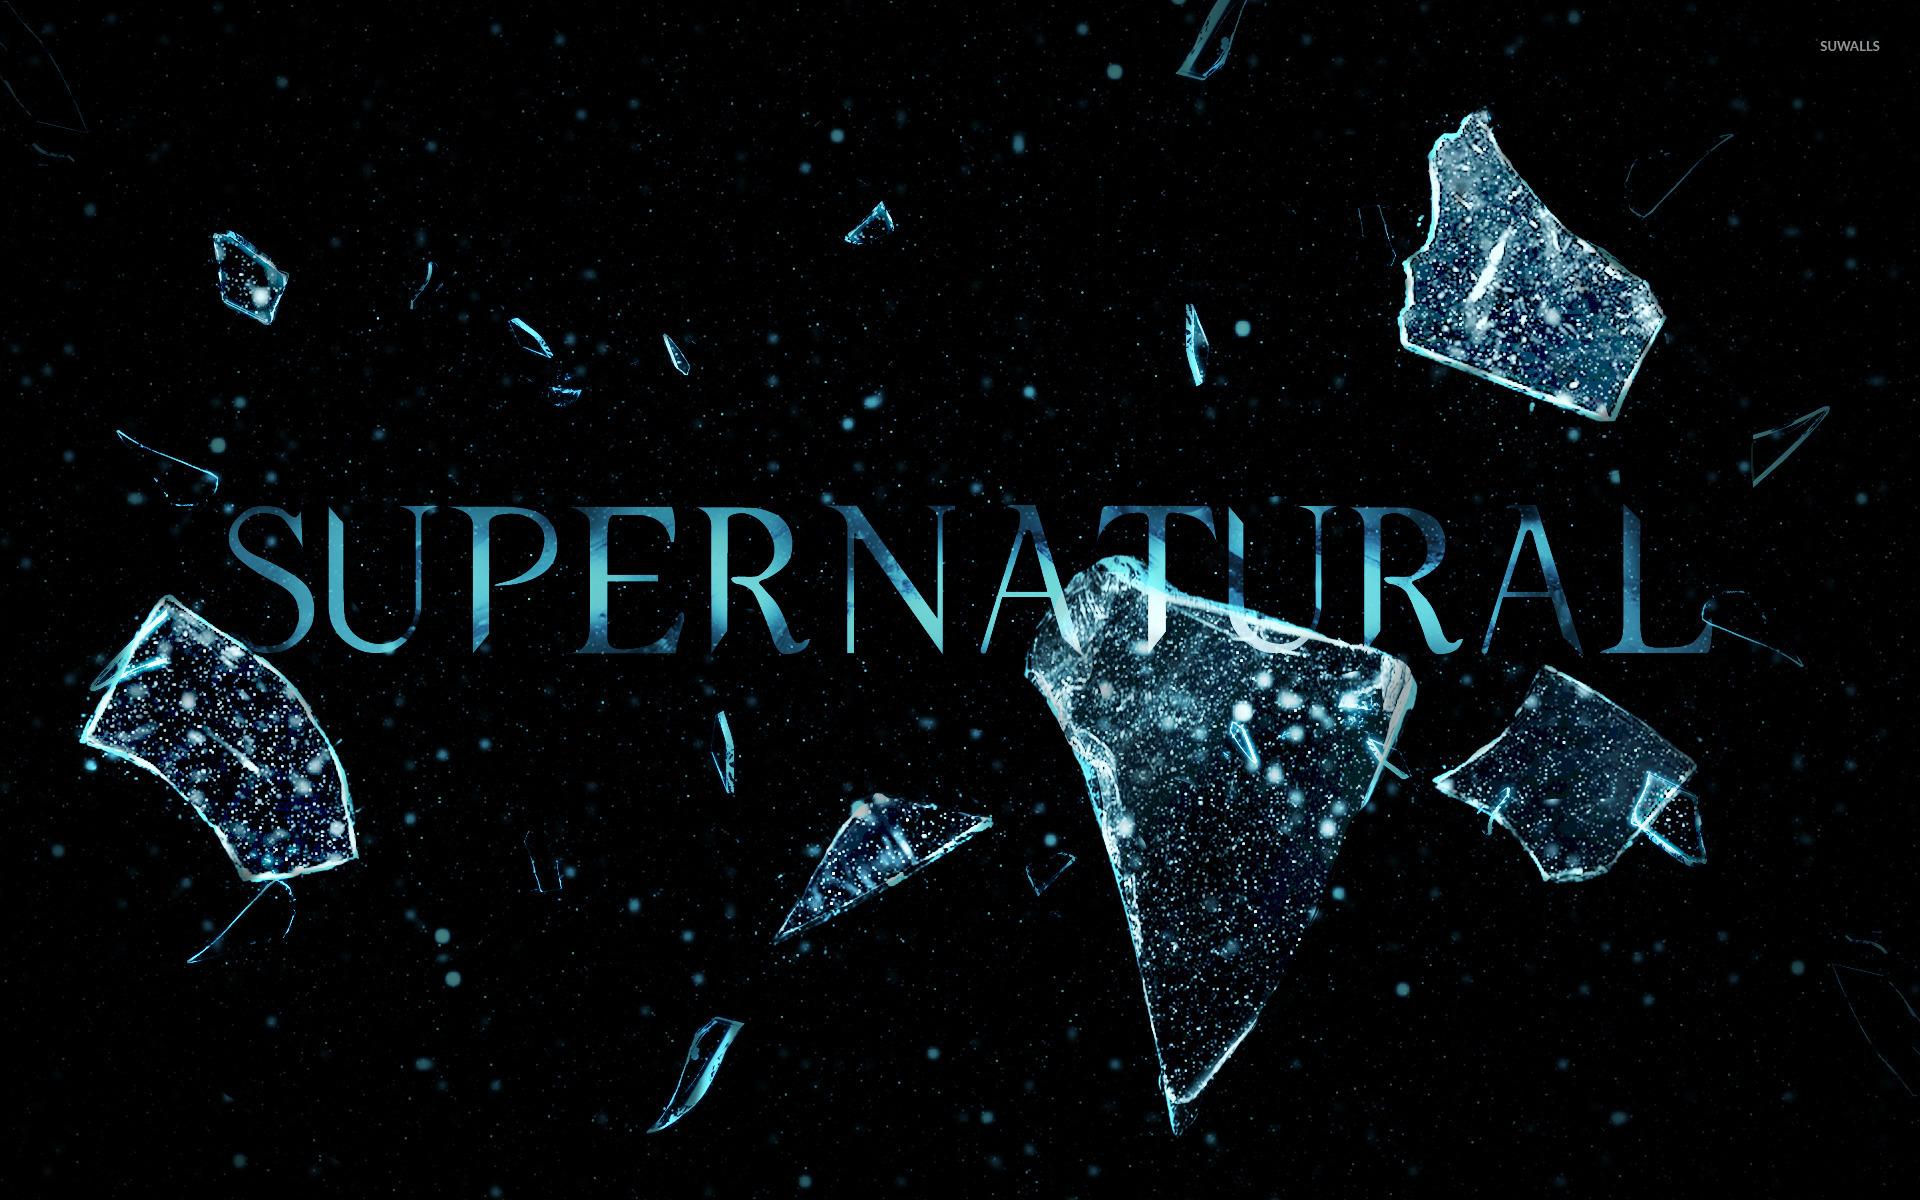 Supernatural wallpaper tv show wallpapers 391 supernatural wallpaper voltagebd Image collections